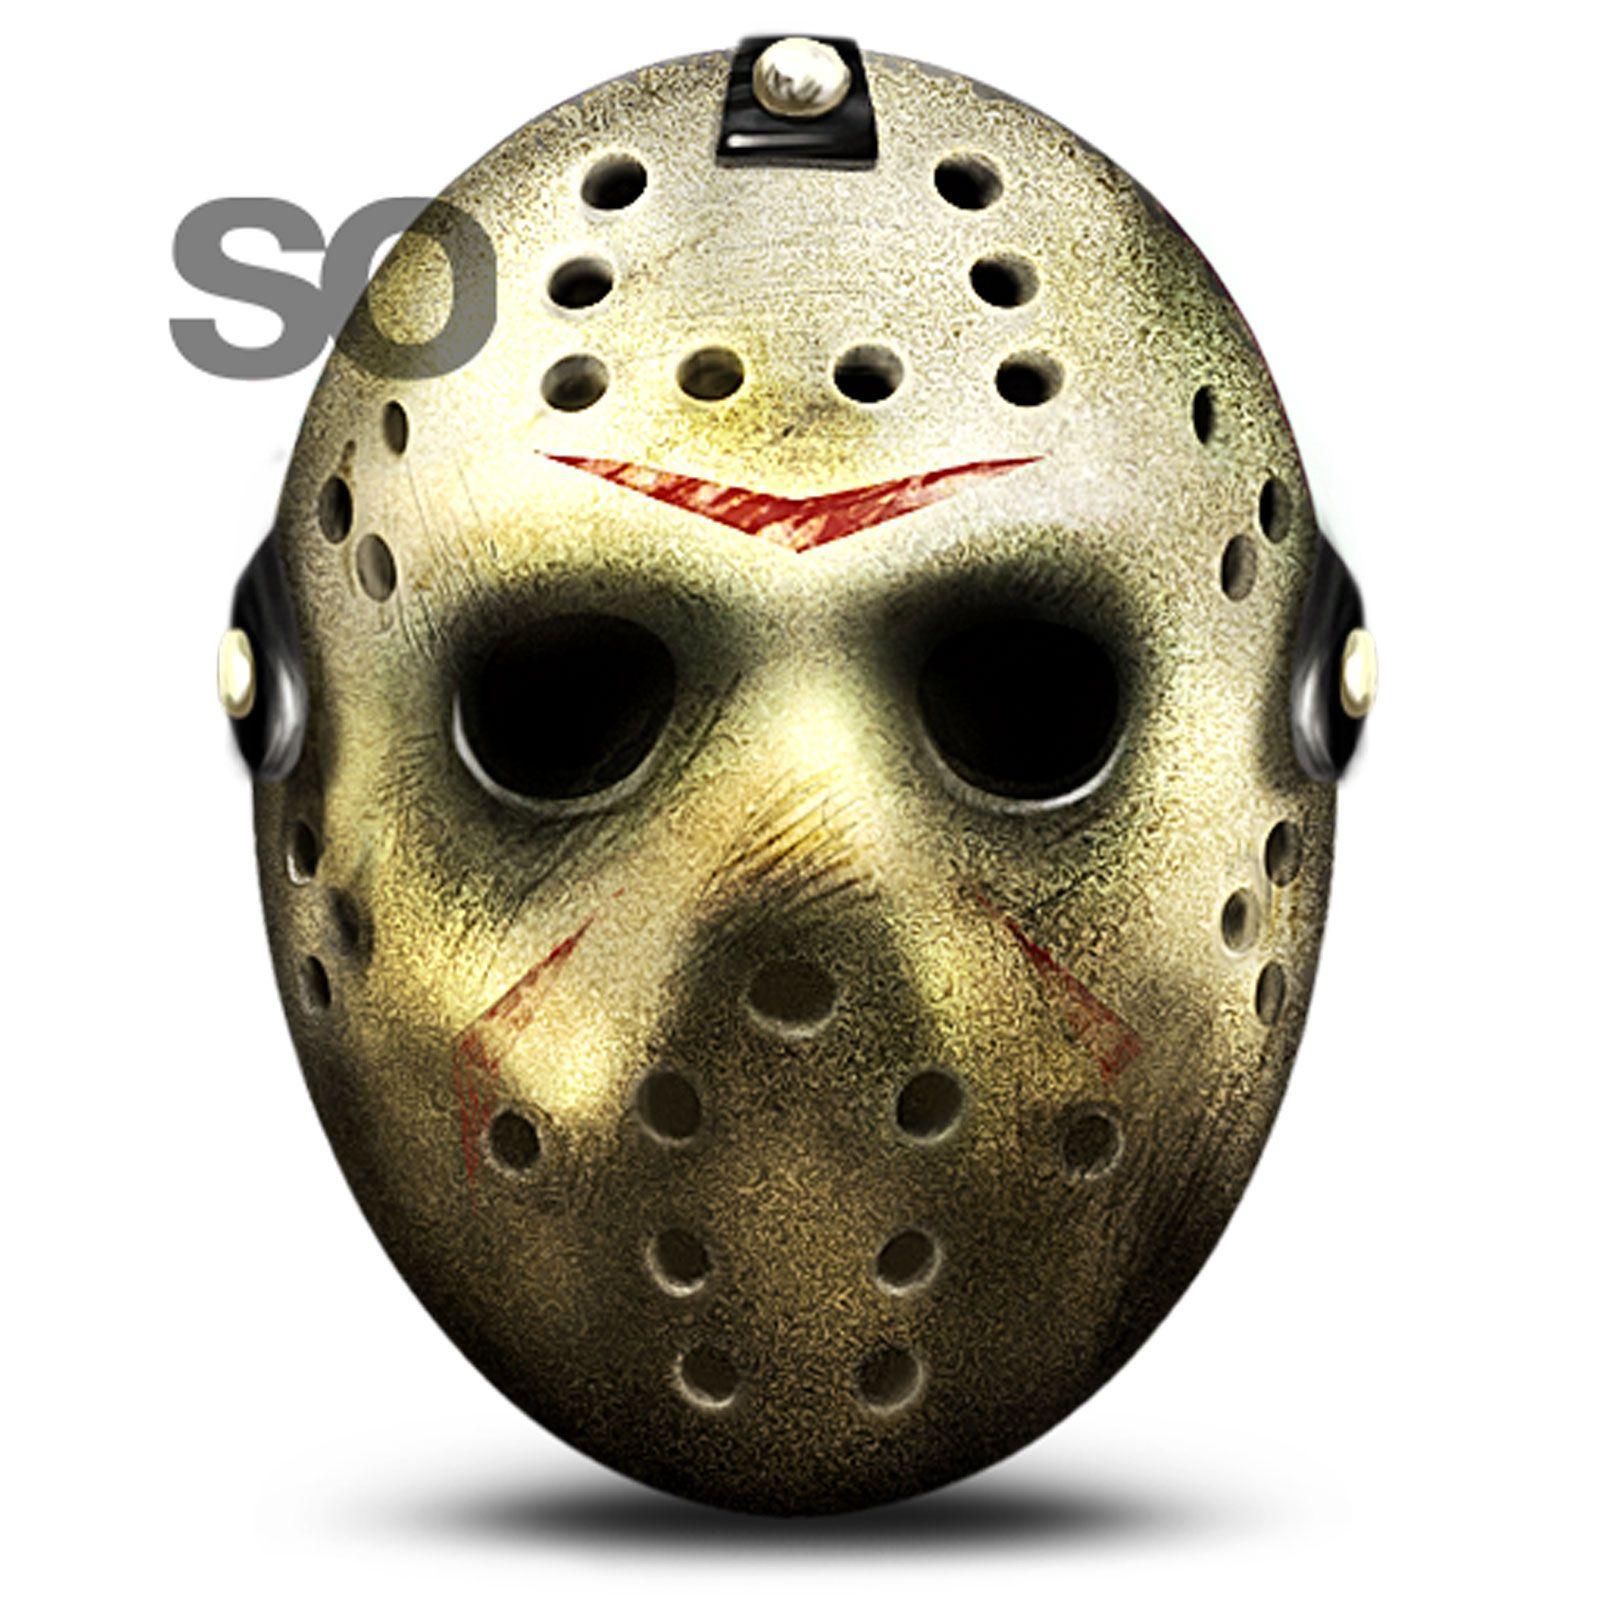 Masque v ritable jason voorhees vendredi 13 freddy hockey airsoft deguisement halloween - Masque halloween film ...